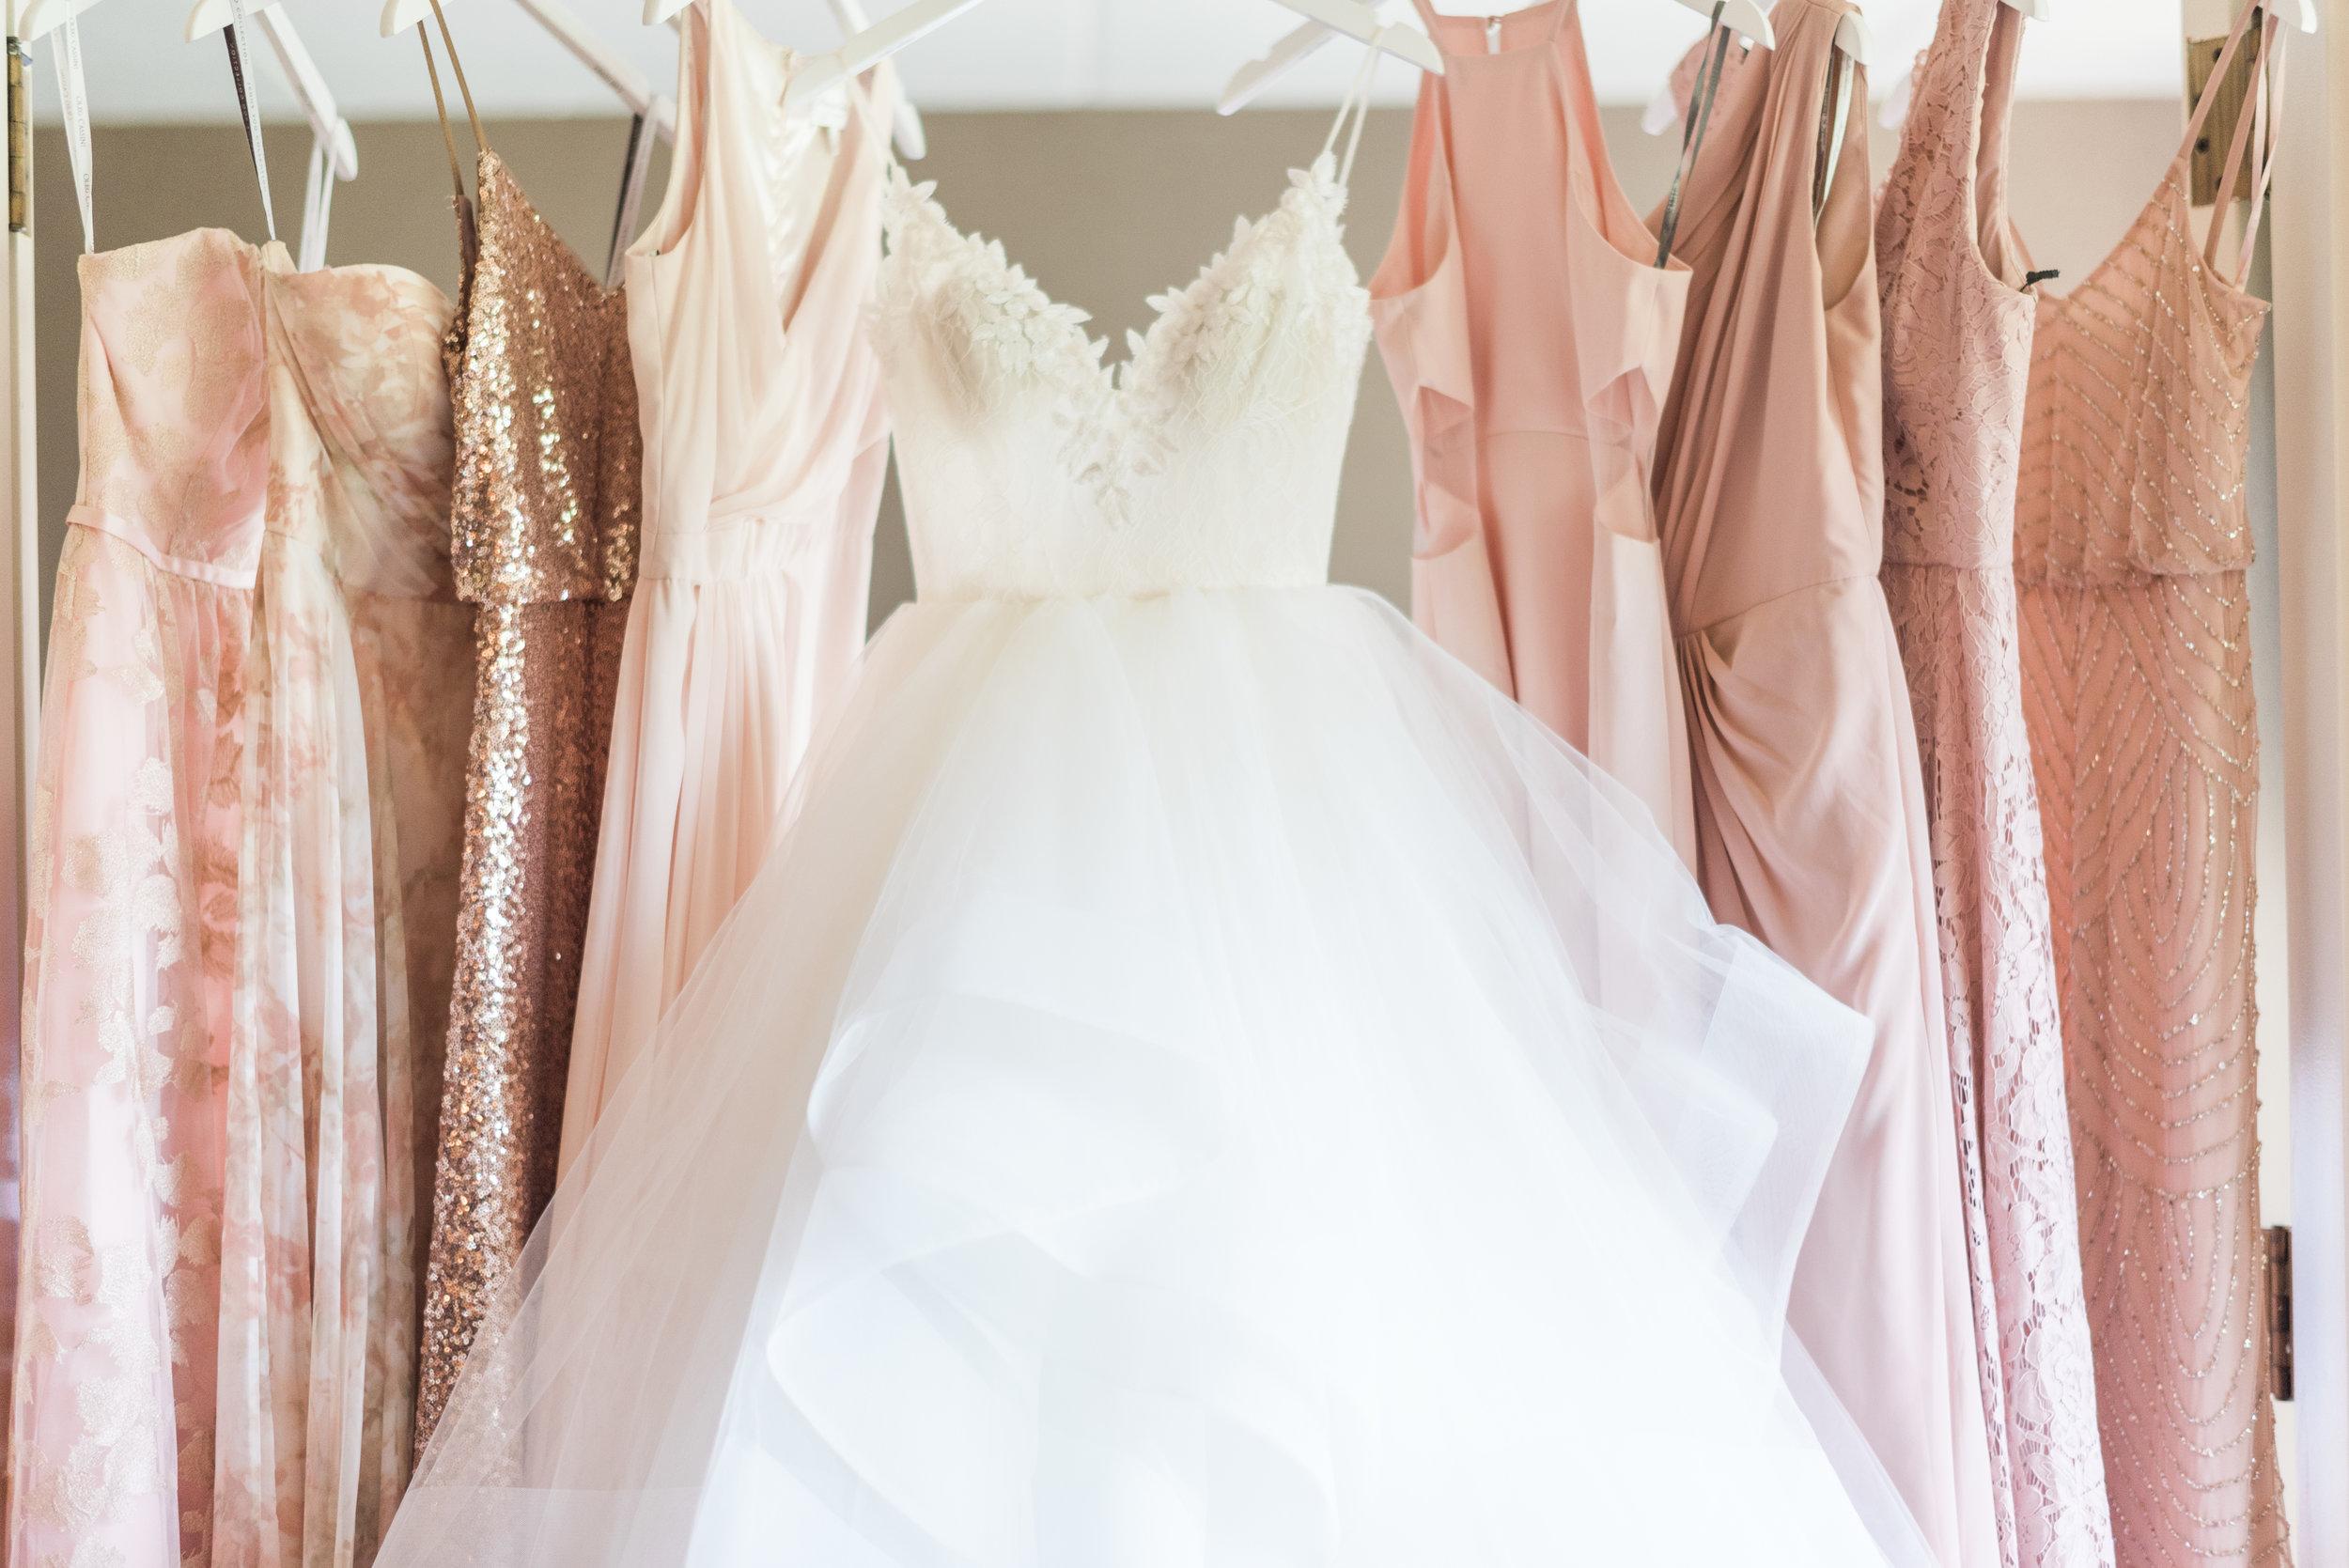 mismatched blush bridesmaids dresses.jpg